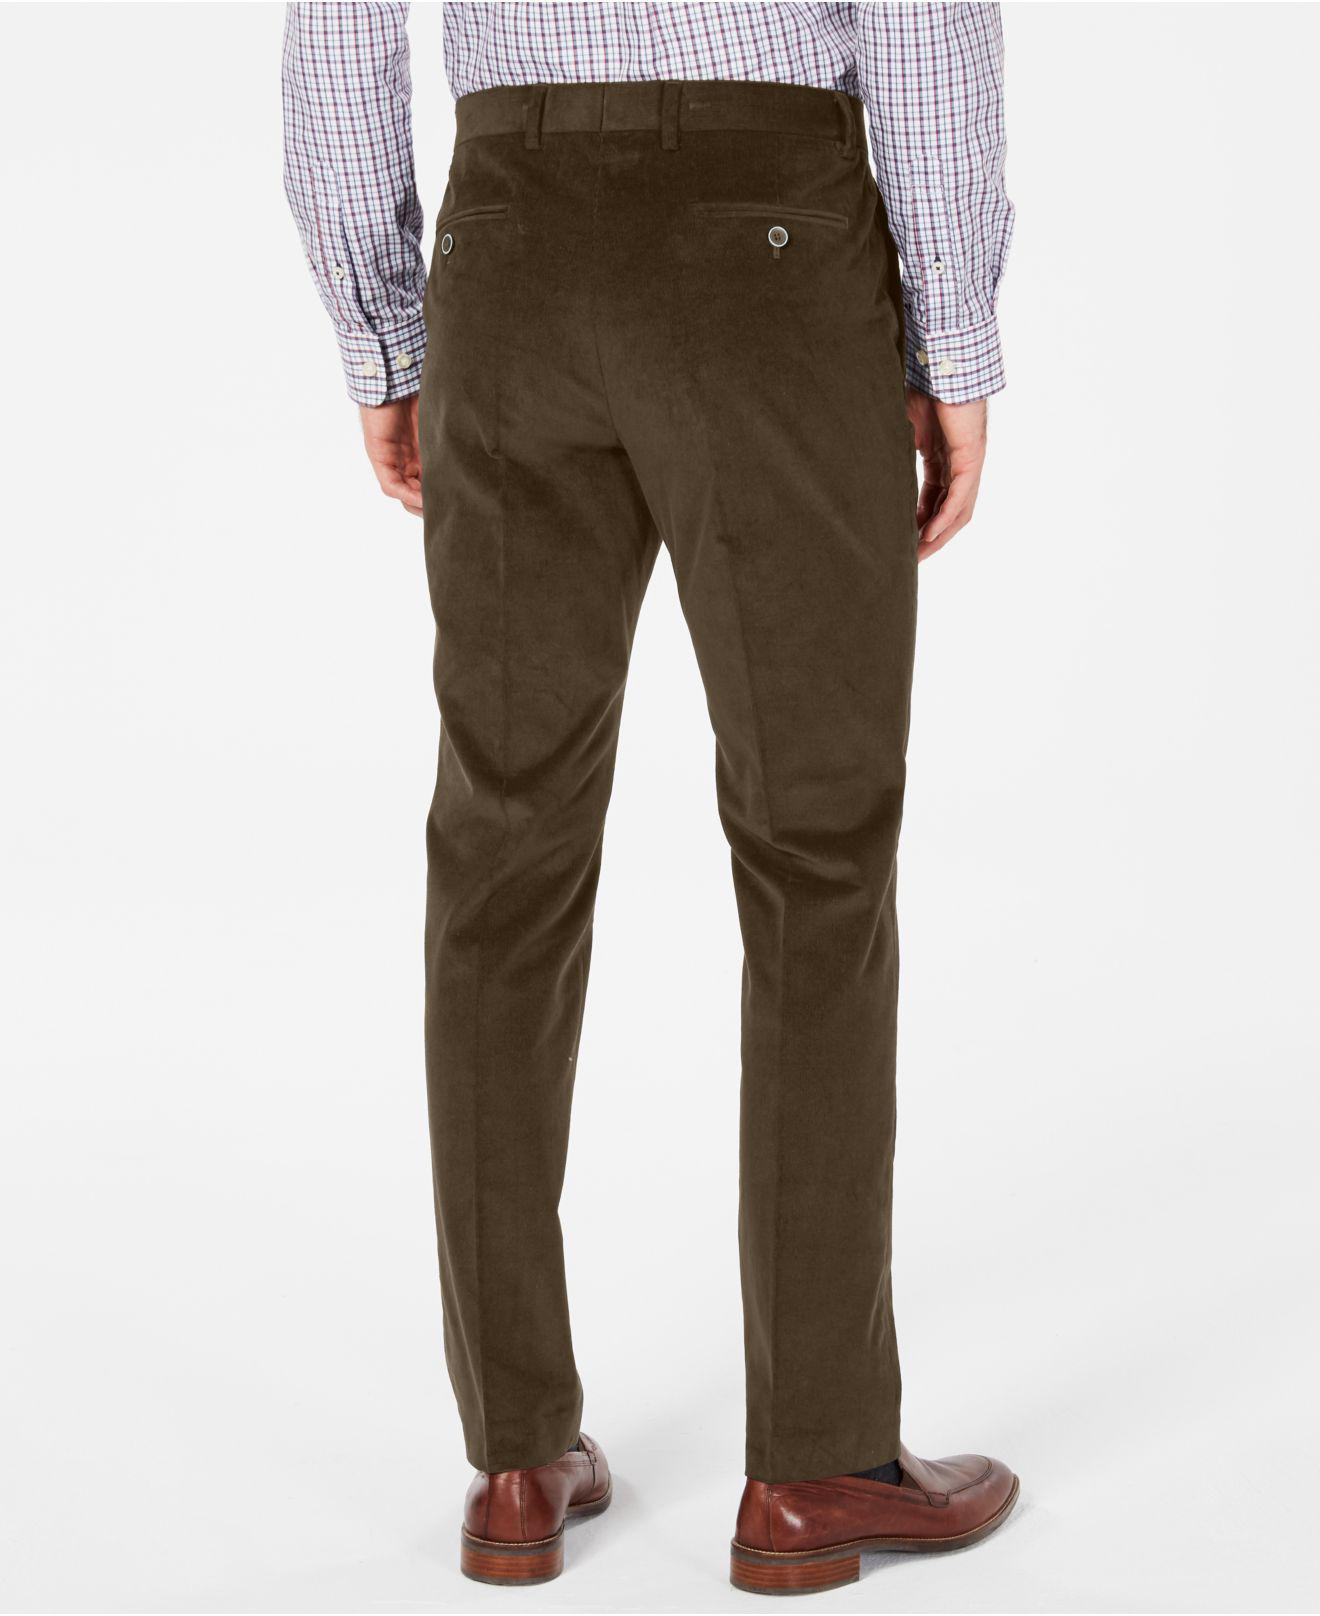 56e7036ac16c7d Lyst - Tommy Hilfiger Modern-fit Th Flex Stretch Corduroy Dress Pants in  Brown for Men